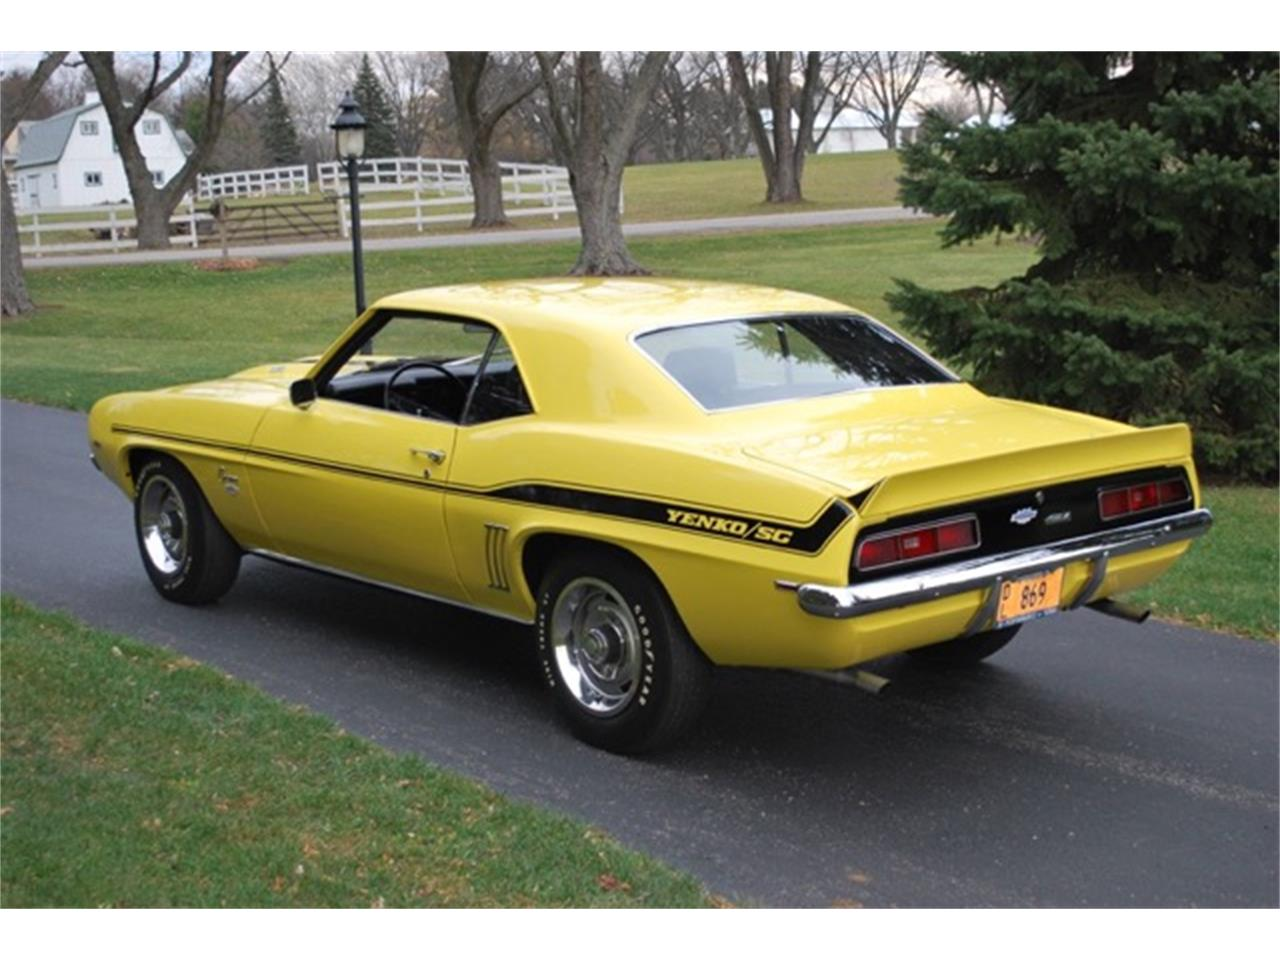 Yenko Camaro For Sale >> 1969 Chevrolet Camaro Copo Yenko For Sale Classiccars Com Cc 937568